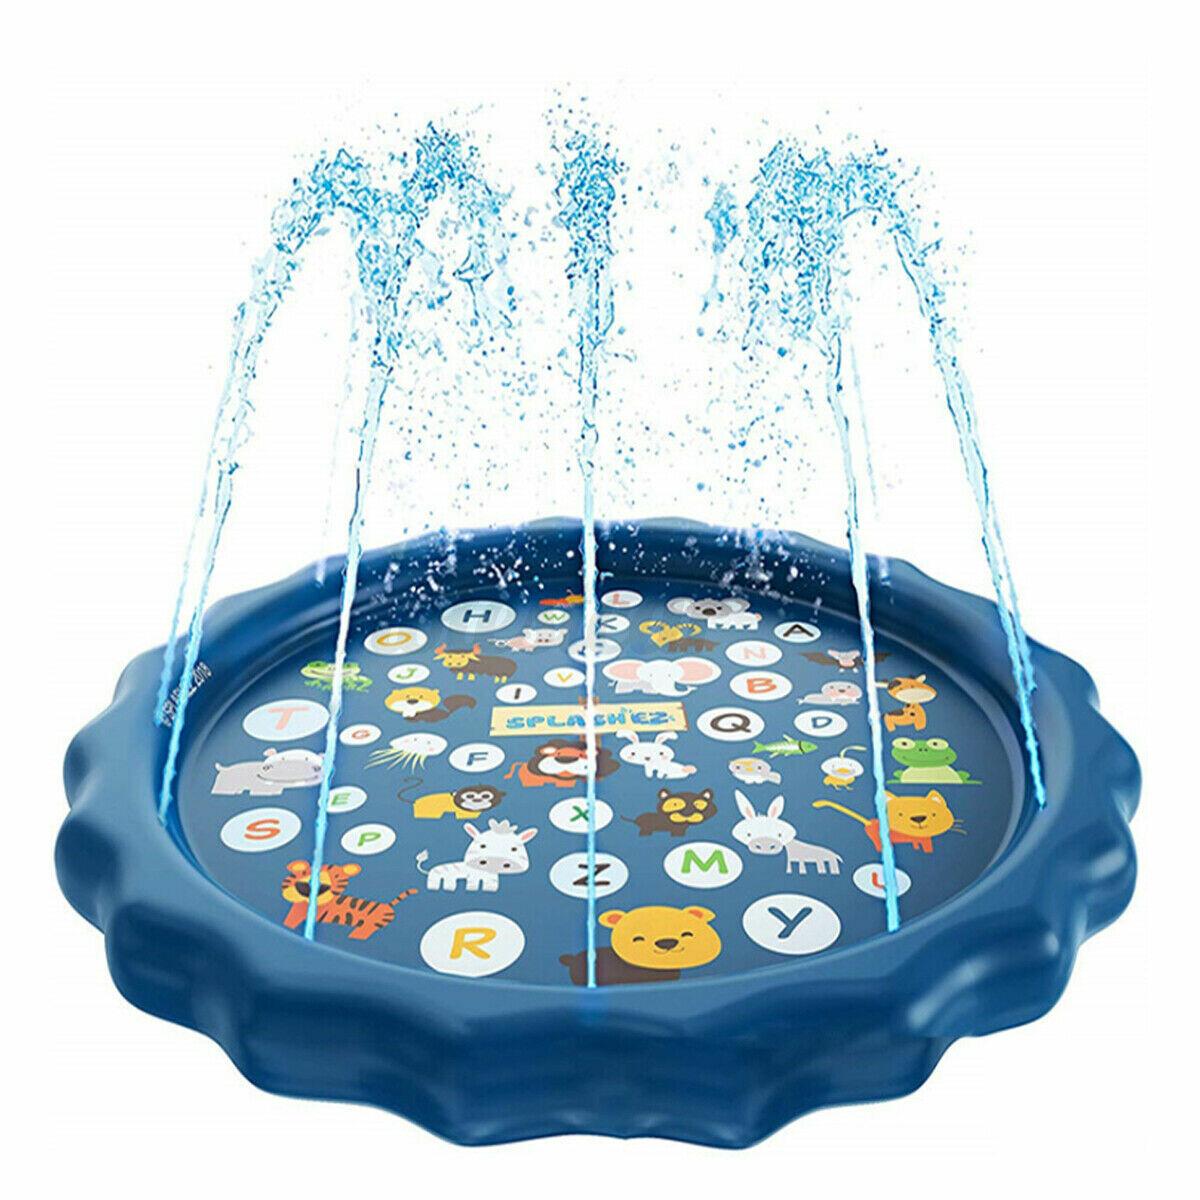 3-in-1 Sprinkler for Kids, Splash Pad, and Wading Pool for Learning – Children's Sprinkler Pool, 68''Inflatable Water